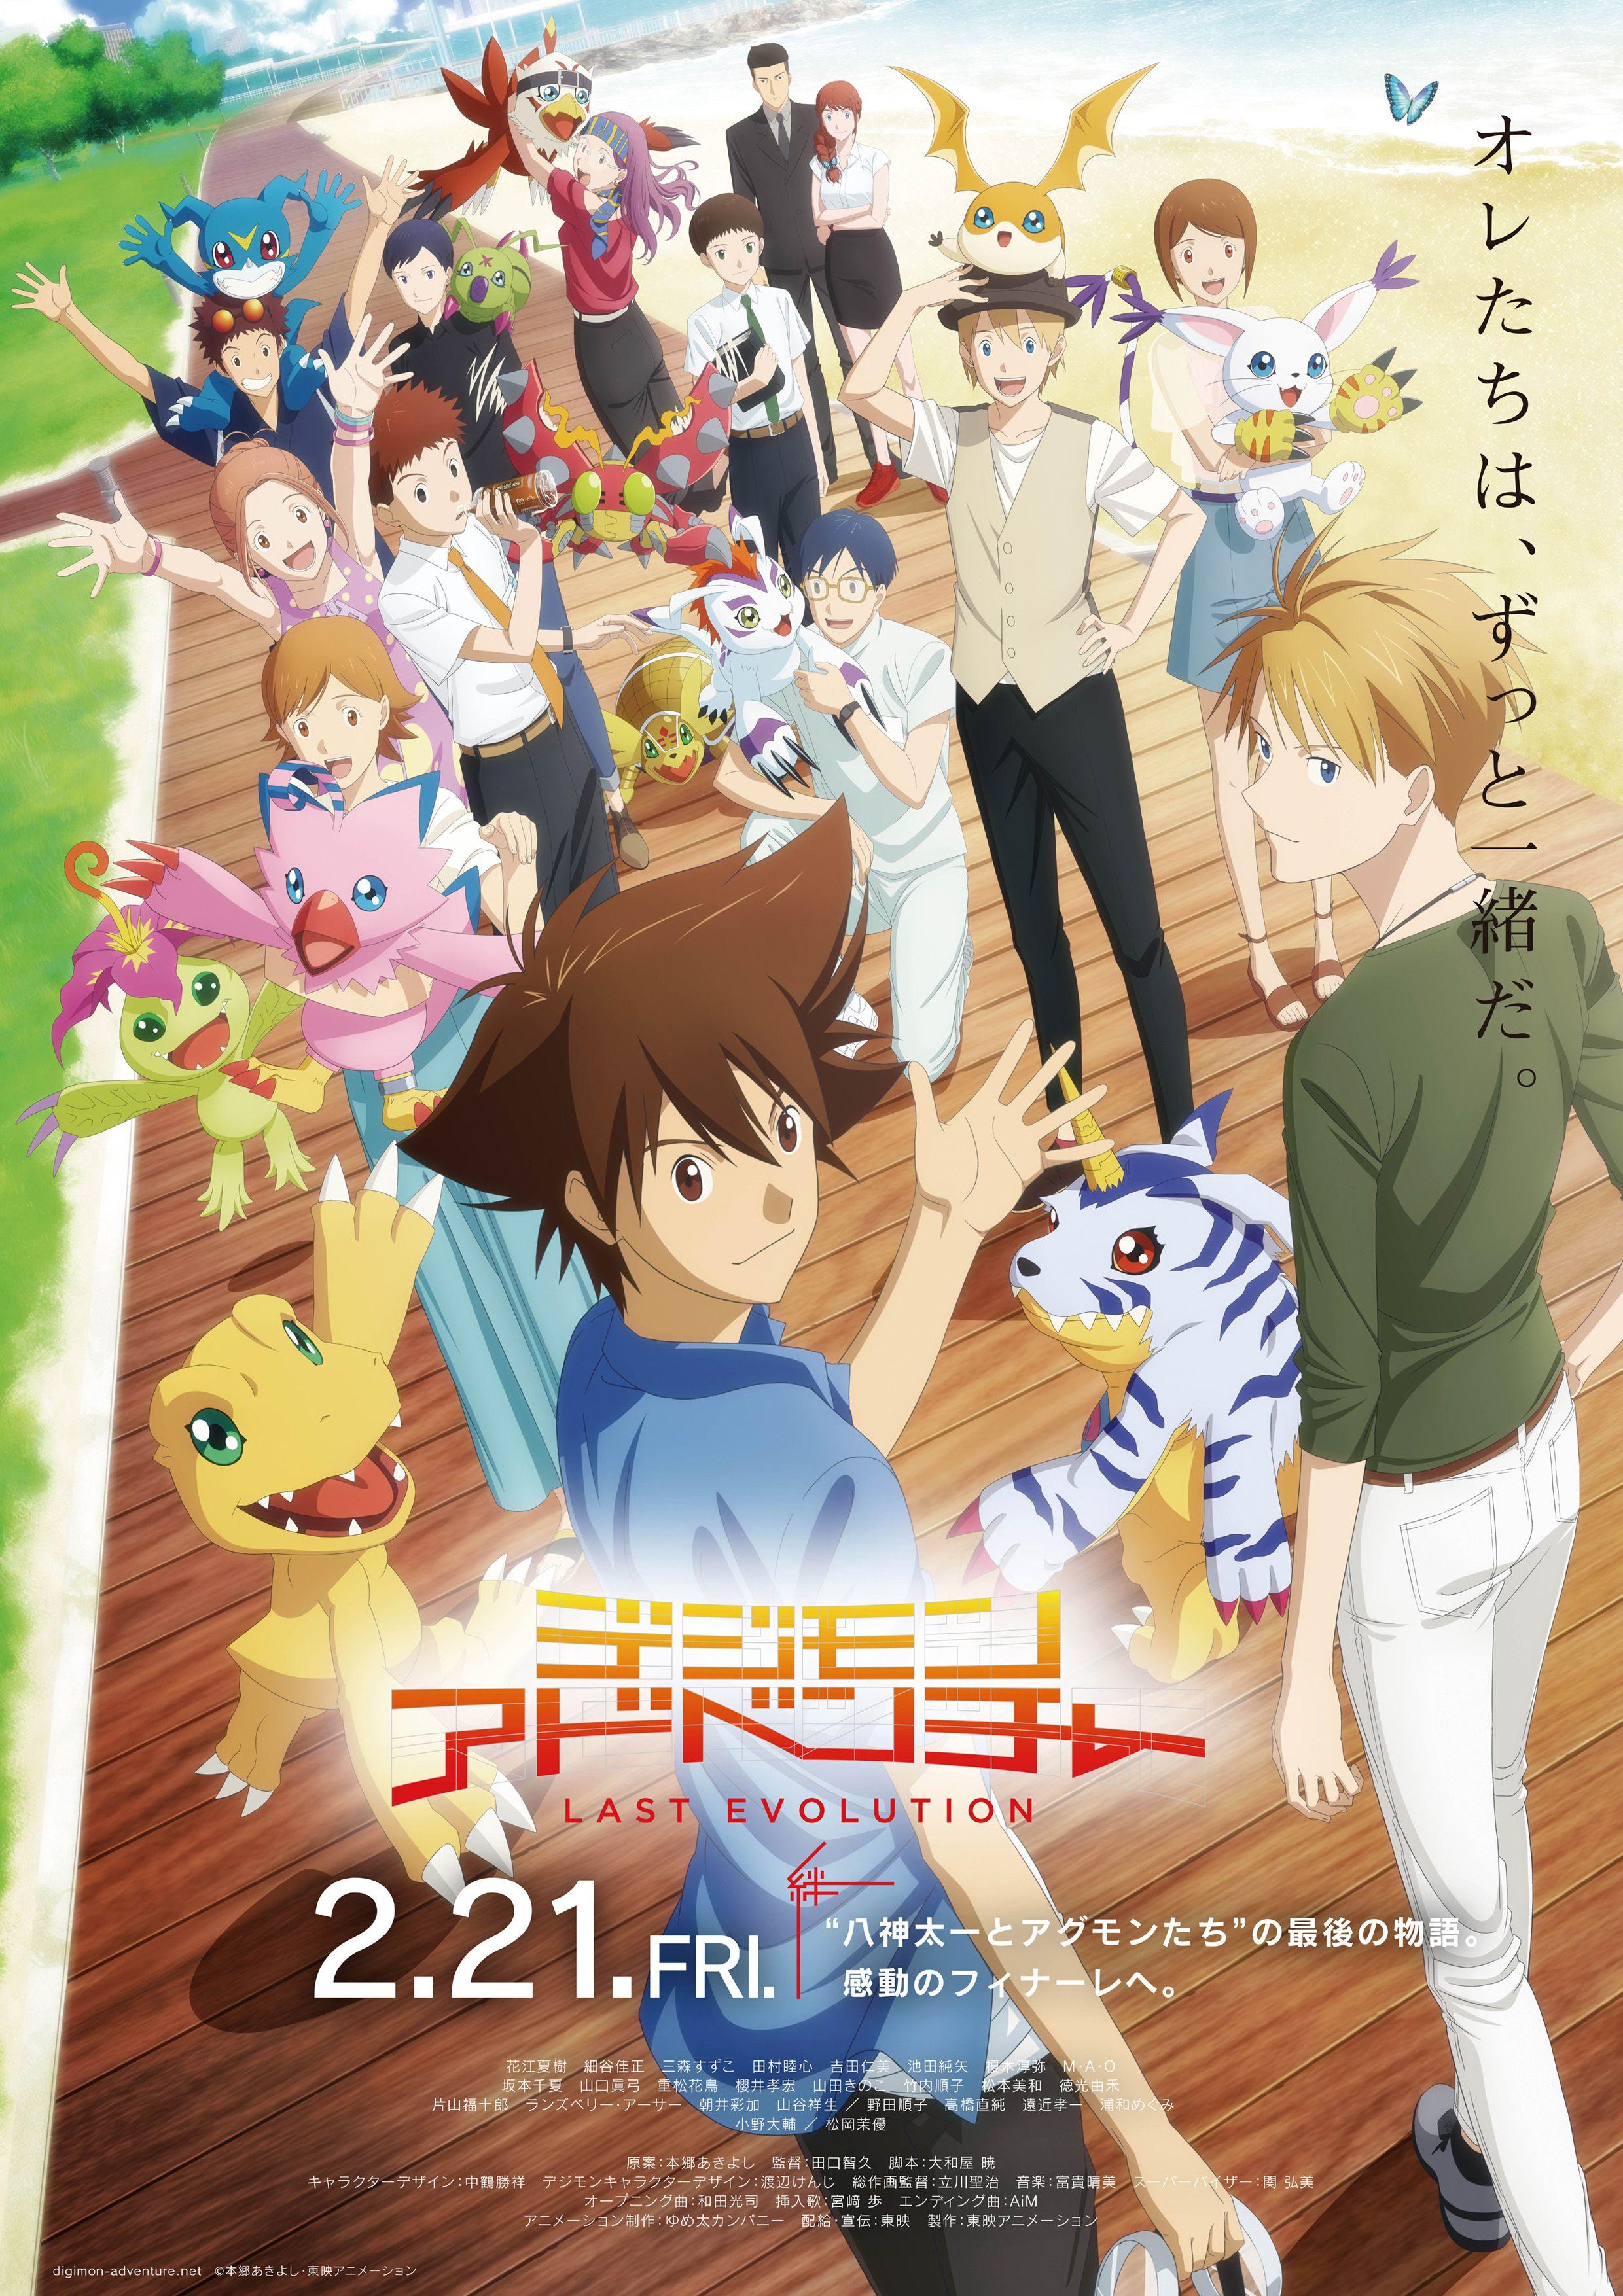 Anime Decoy A Final Farewell Digimon Adventure Last Evolution Kizuna In 2021 Digimon Adventure Digimon Digimon Adventure Tri